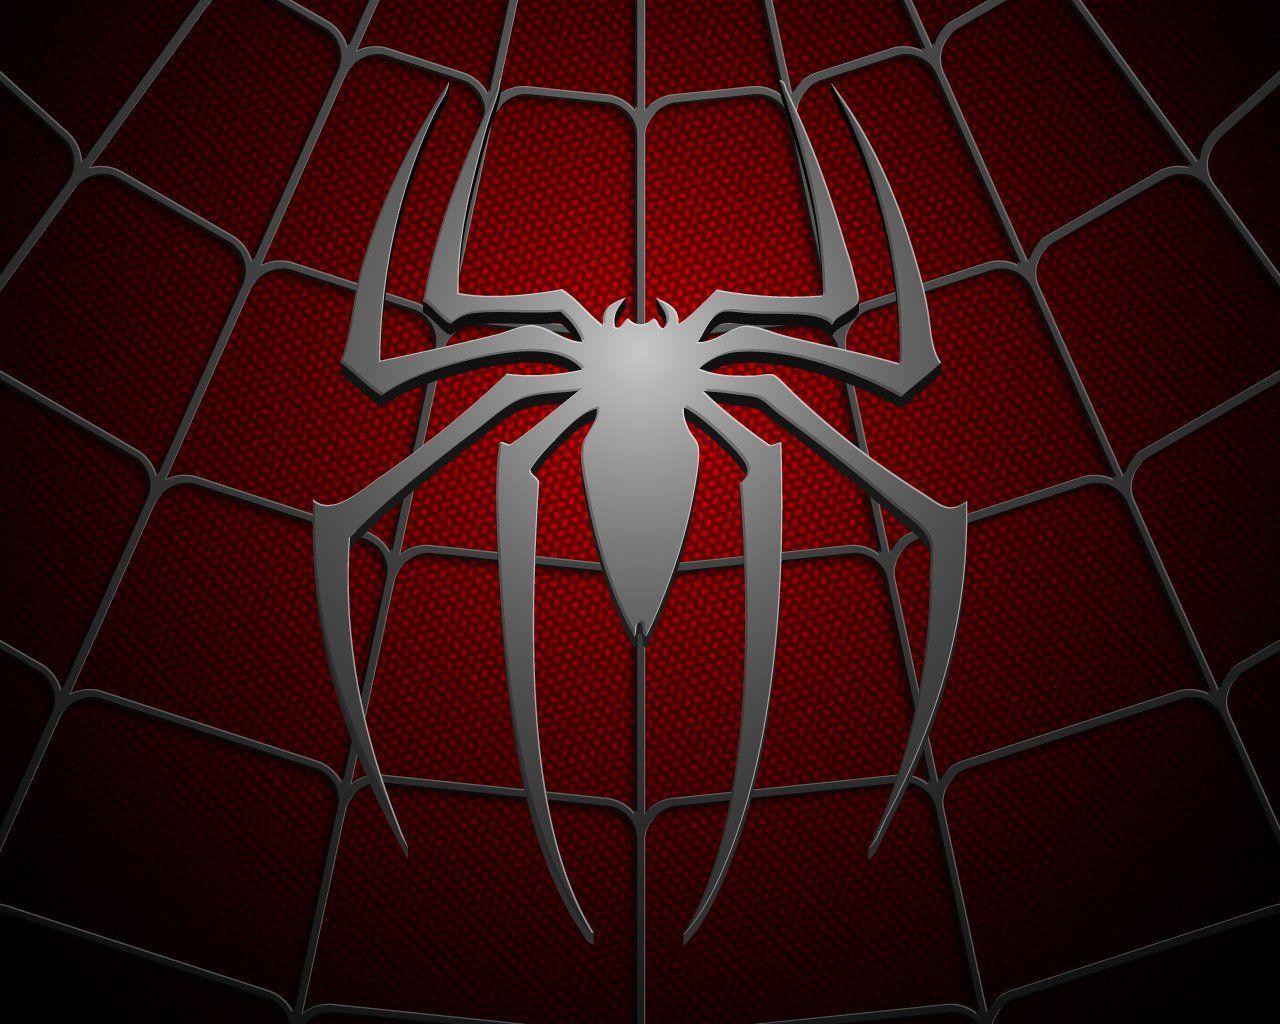 Spider Man Mask Logo Wallpapers Top Free Spider Man Mask